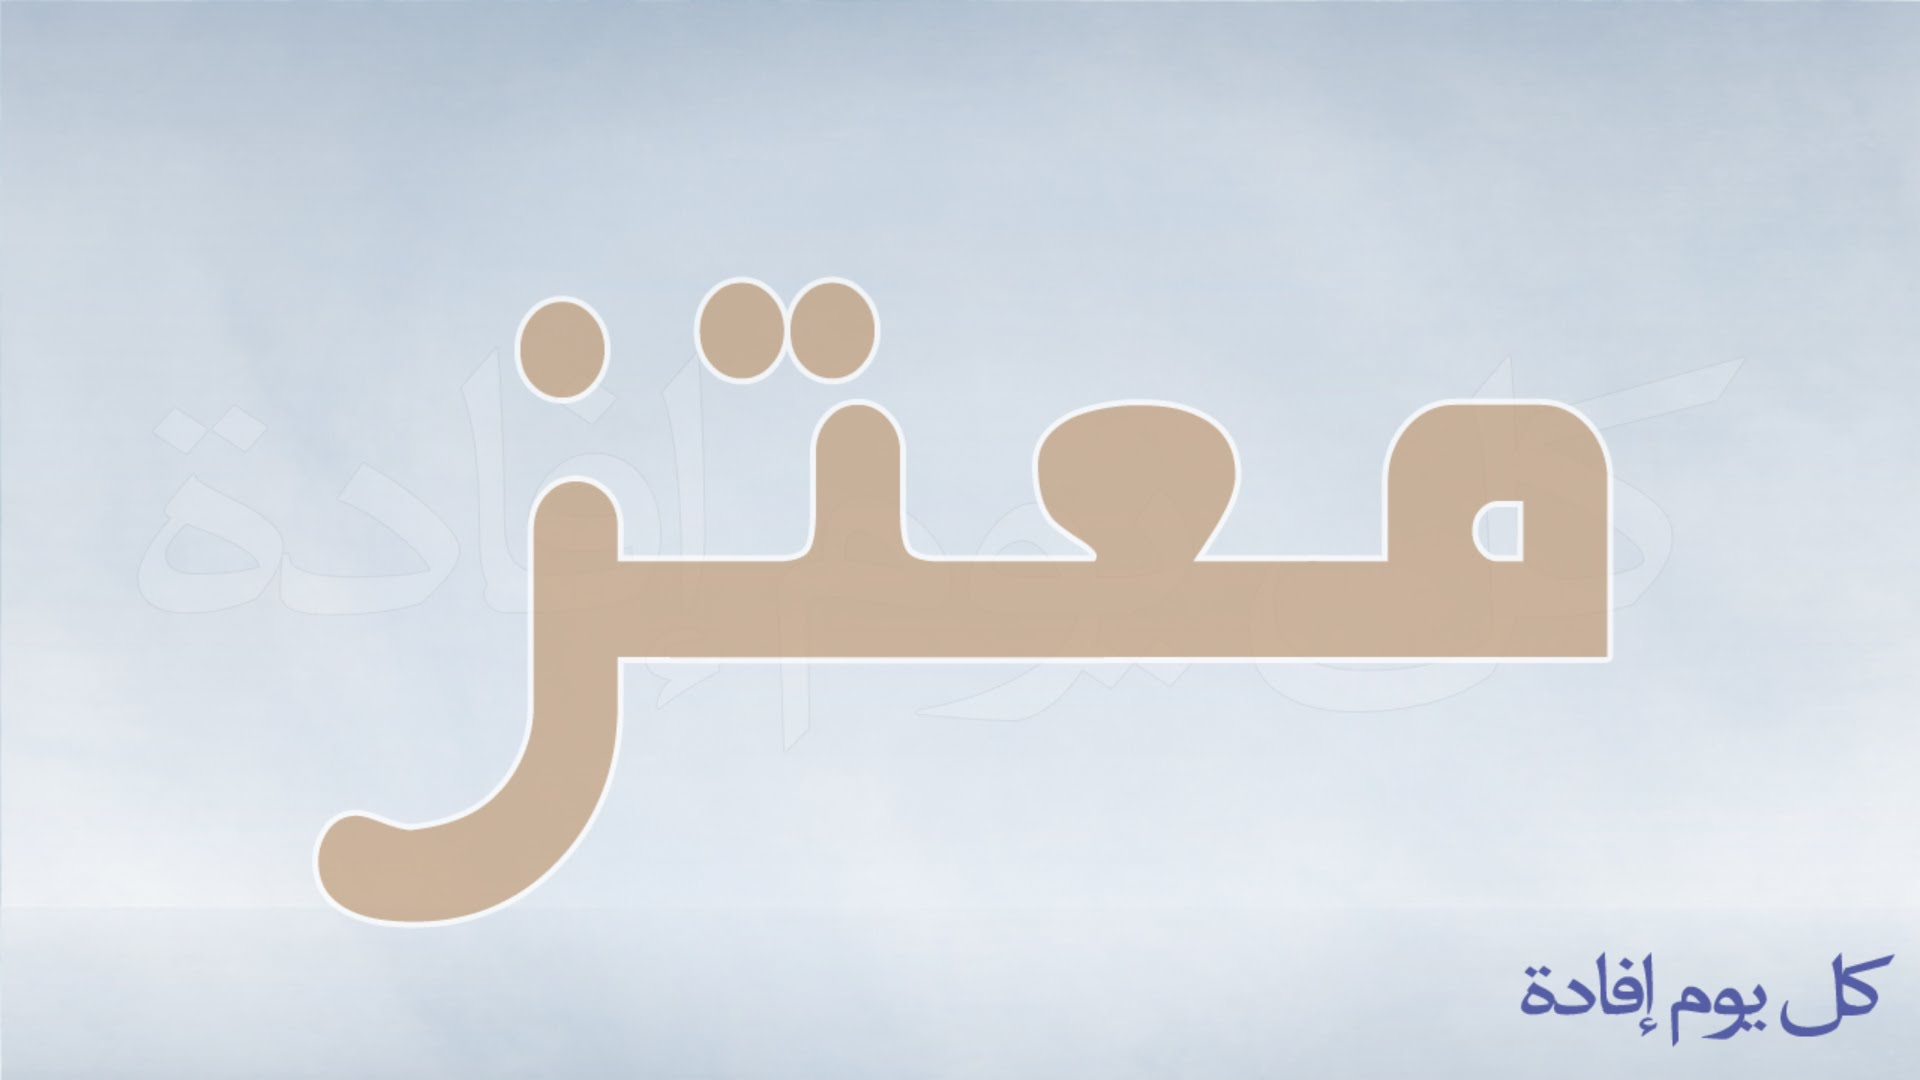 صور اسم معتز مزخرف انجليزى معنى اسم معتز و شعر و غلاف و رمزيات موقع العنان